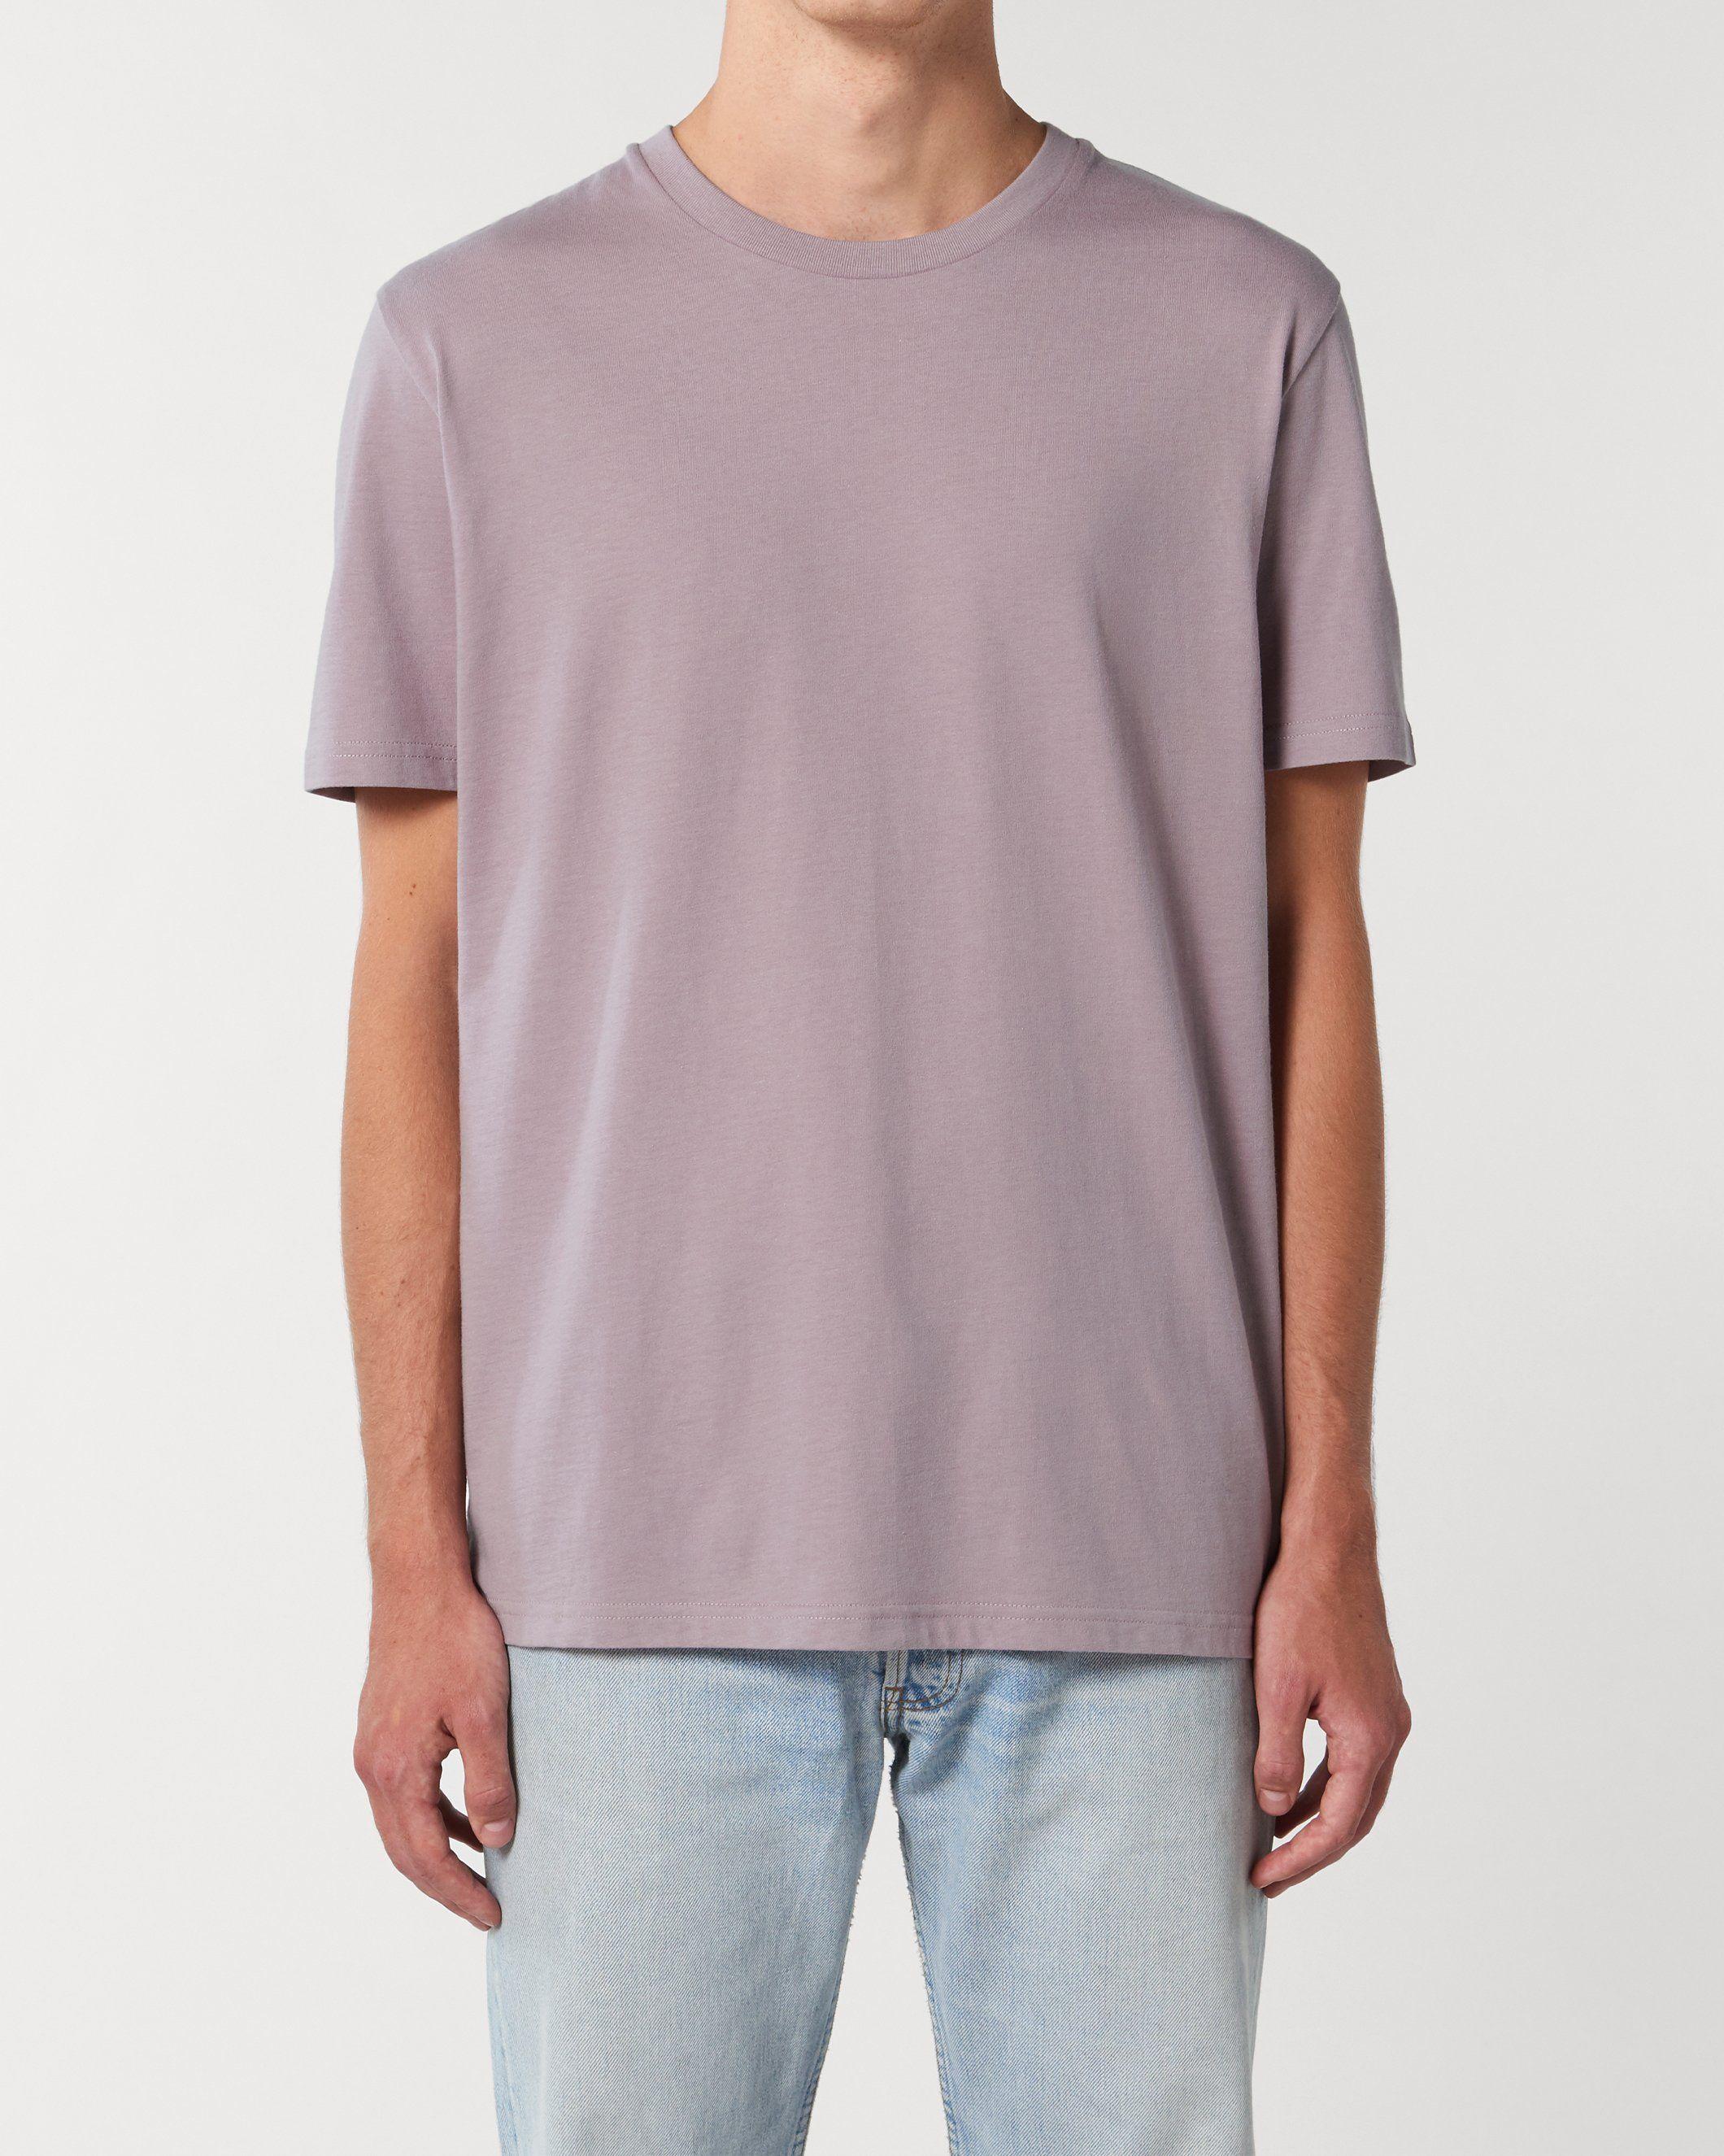 Nauli Unisex Regular Fit T-Shirt in Purple